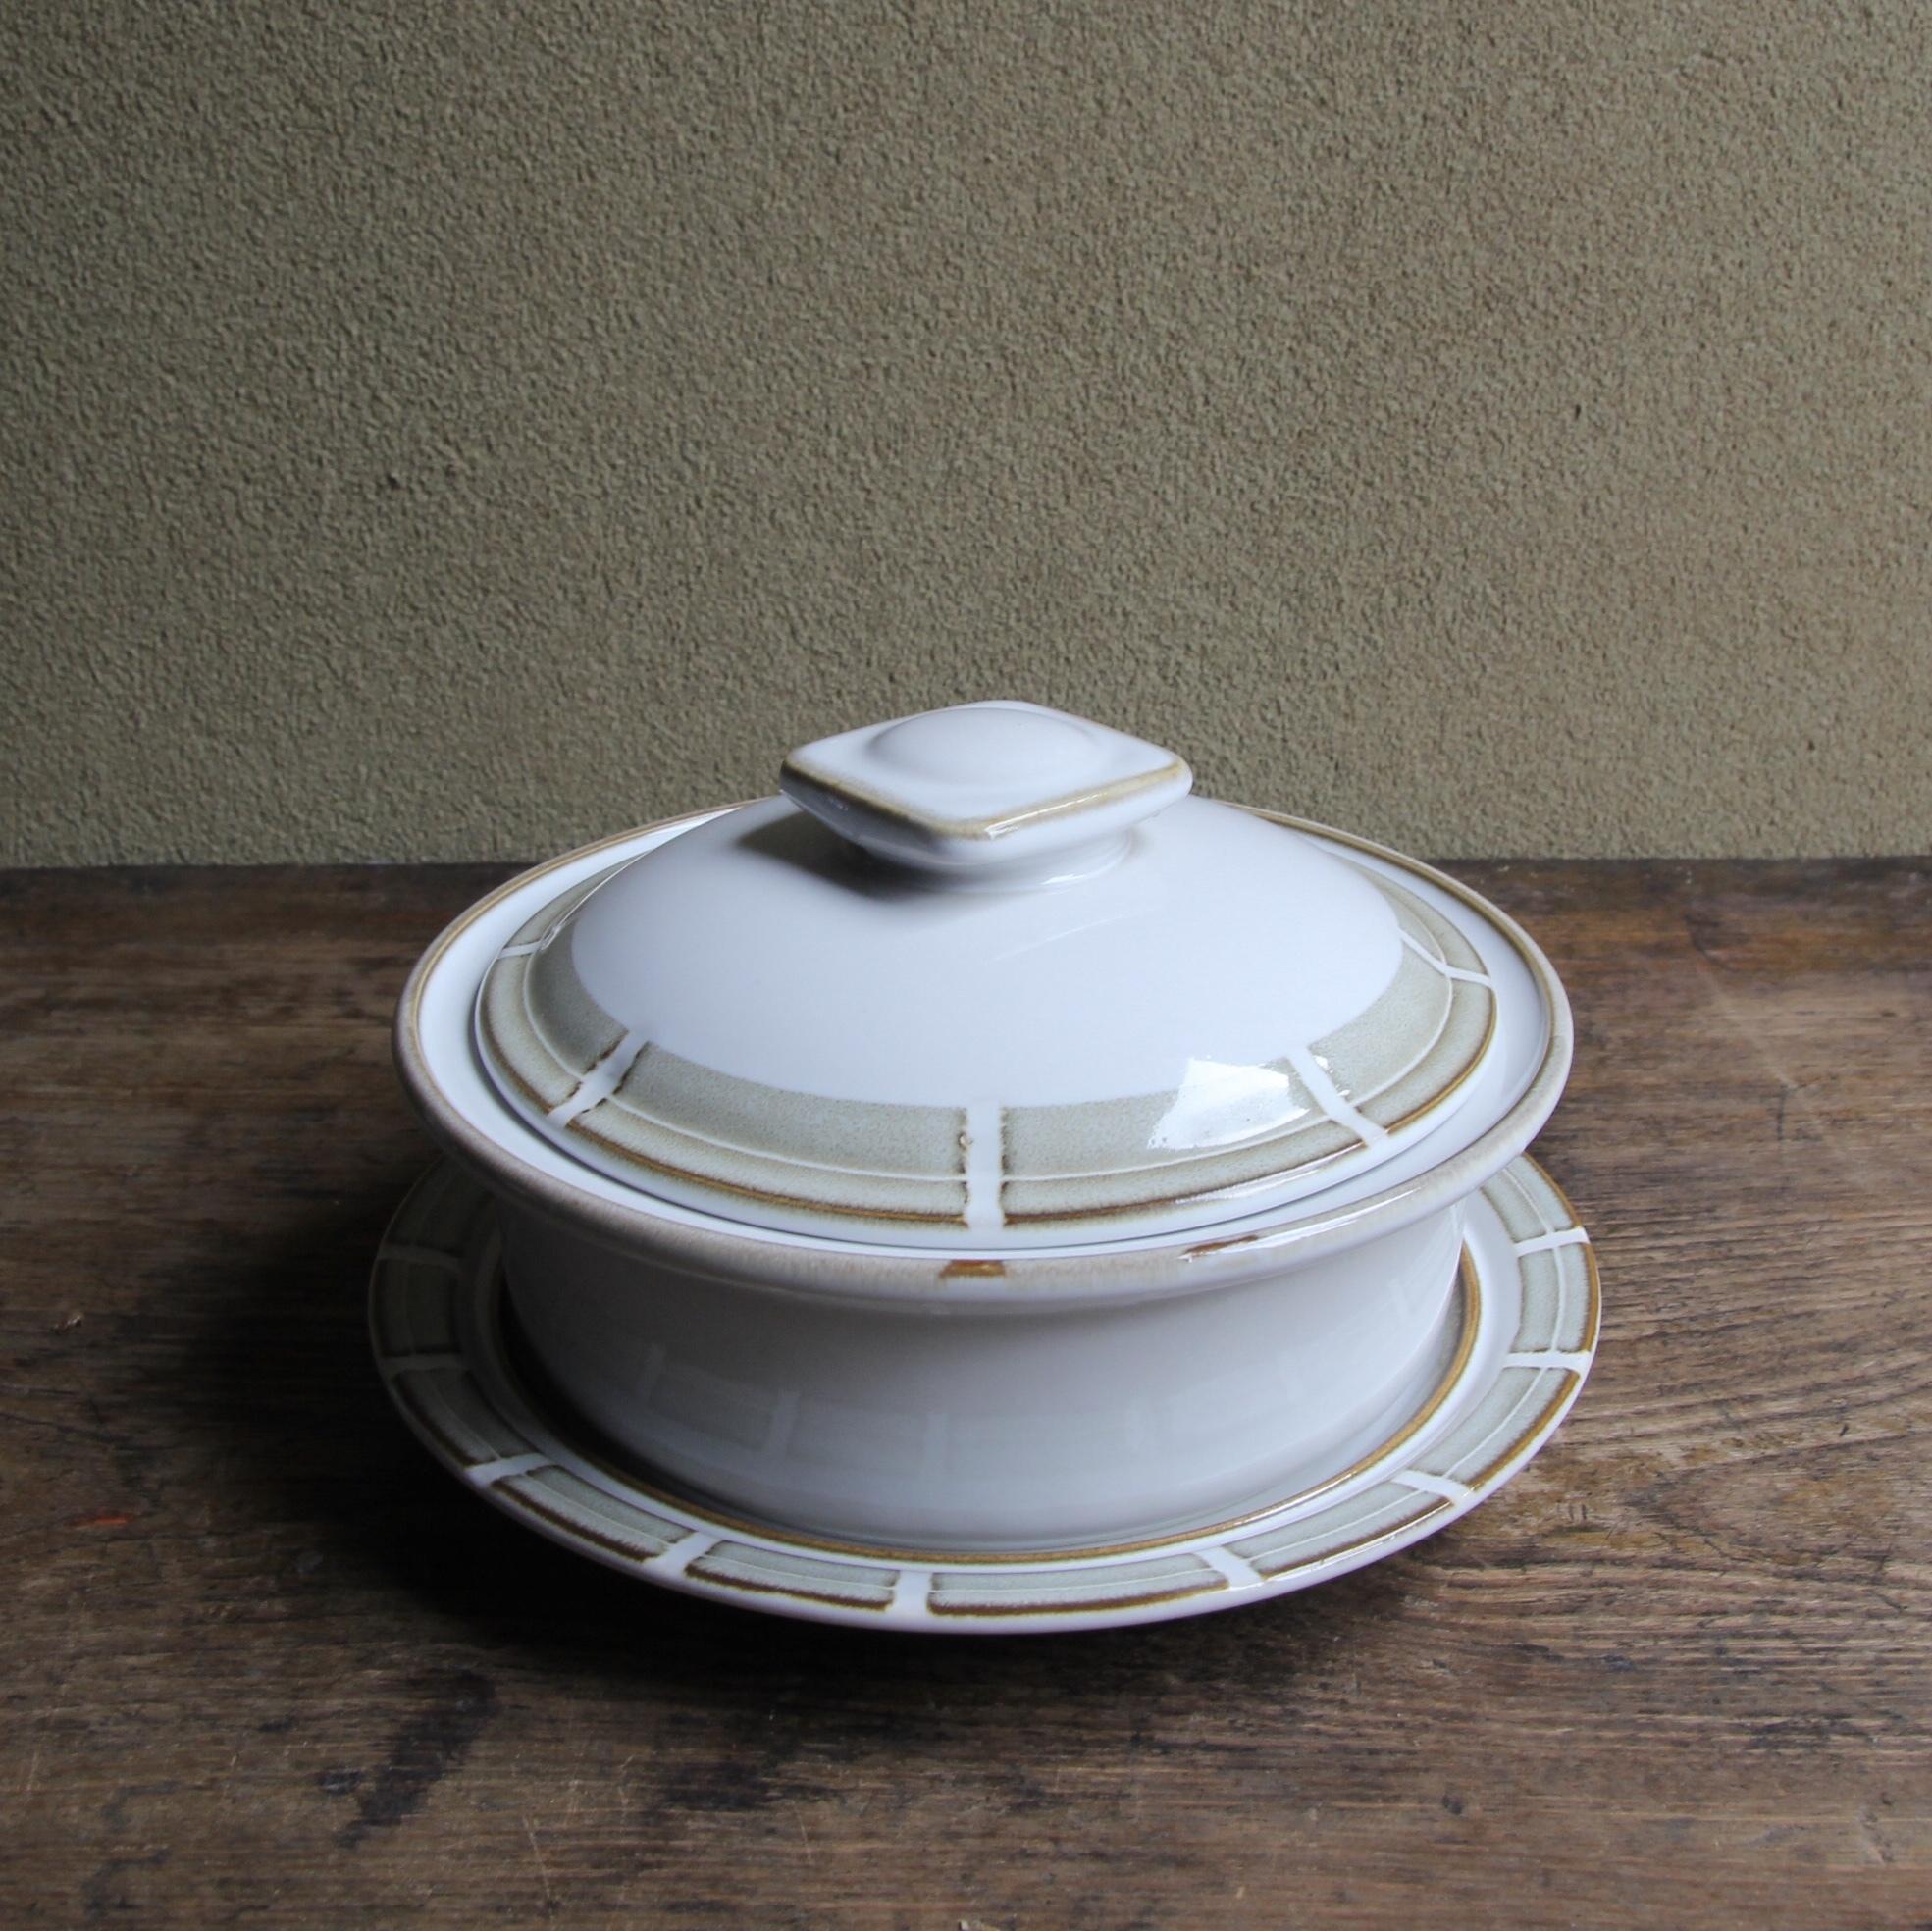 NT ノリタケ 蓋つきスープカップ&小皿  在庫2セット